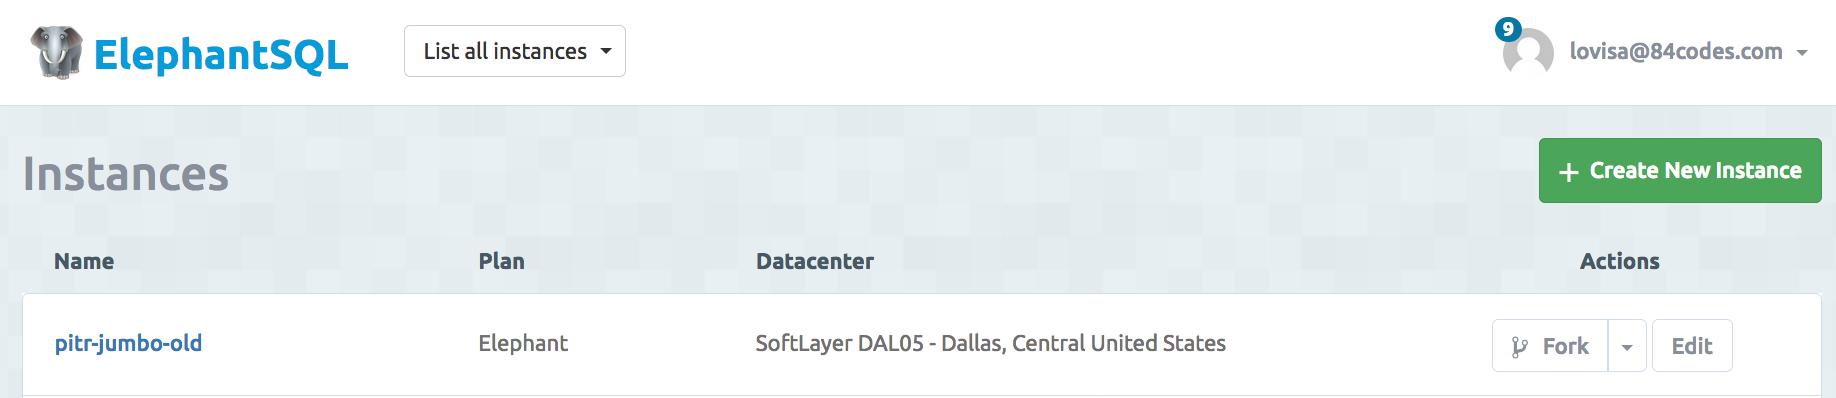 Documentation | ElephantSQL